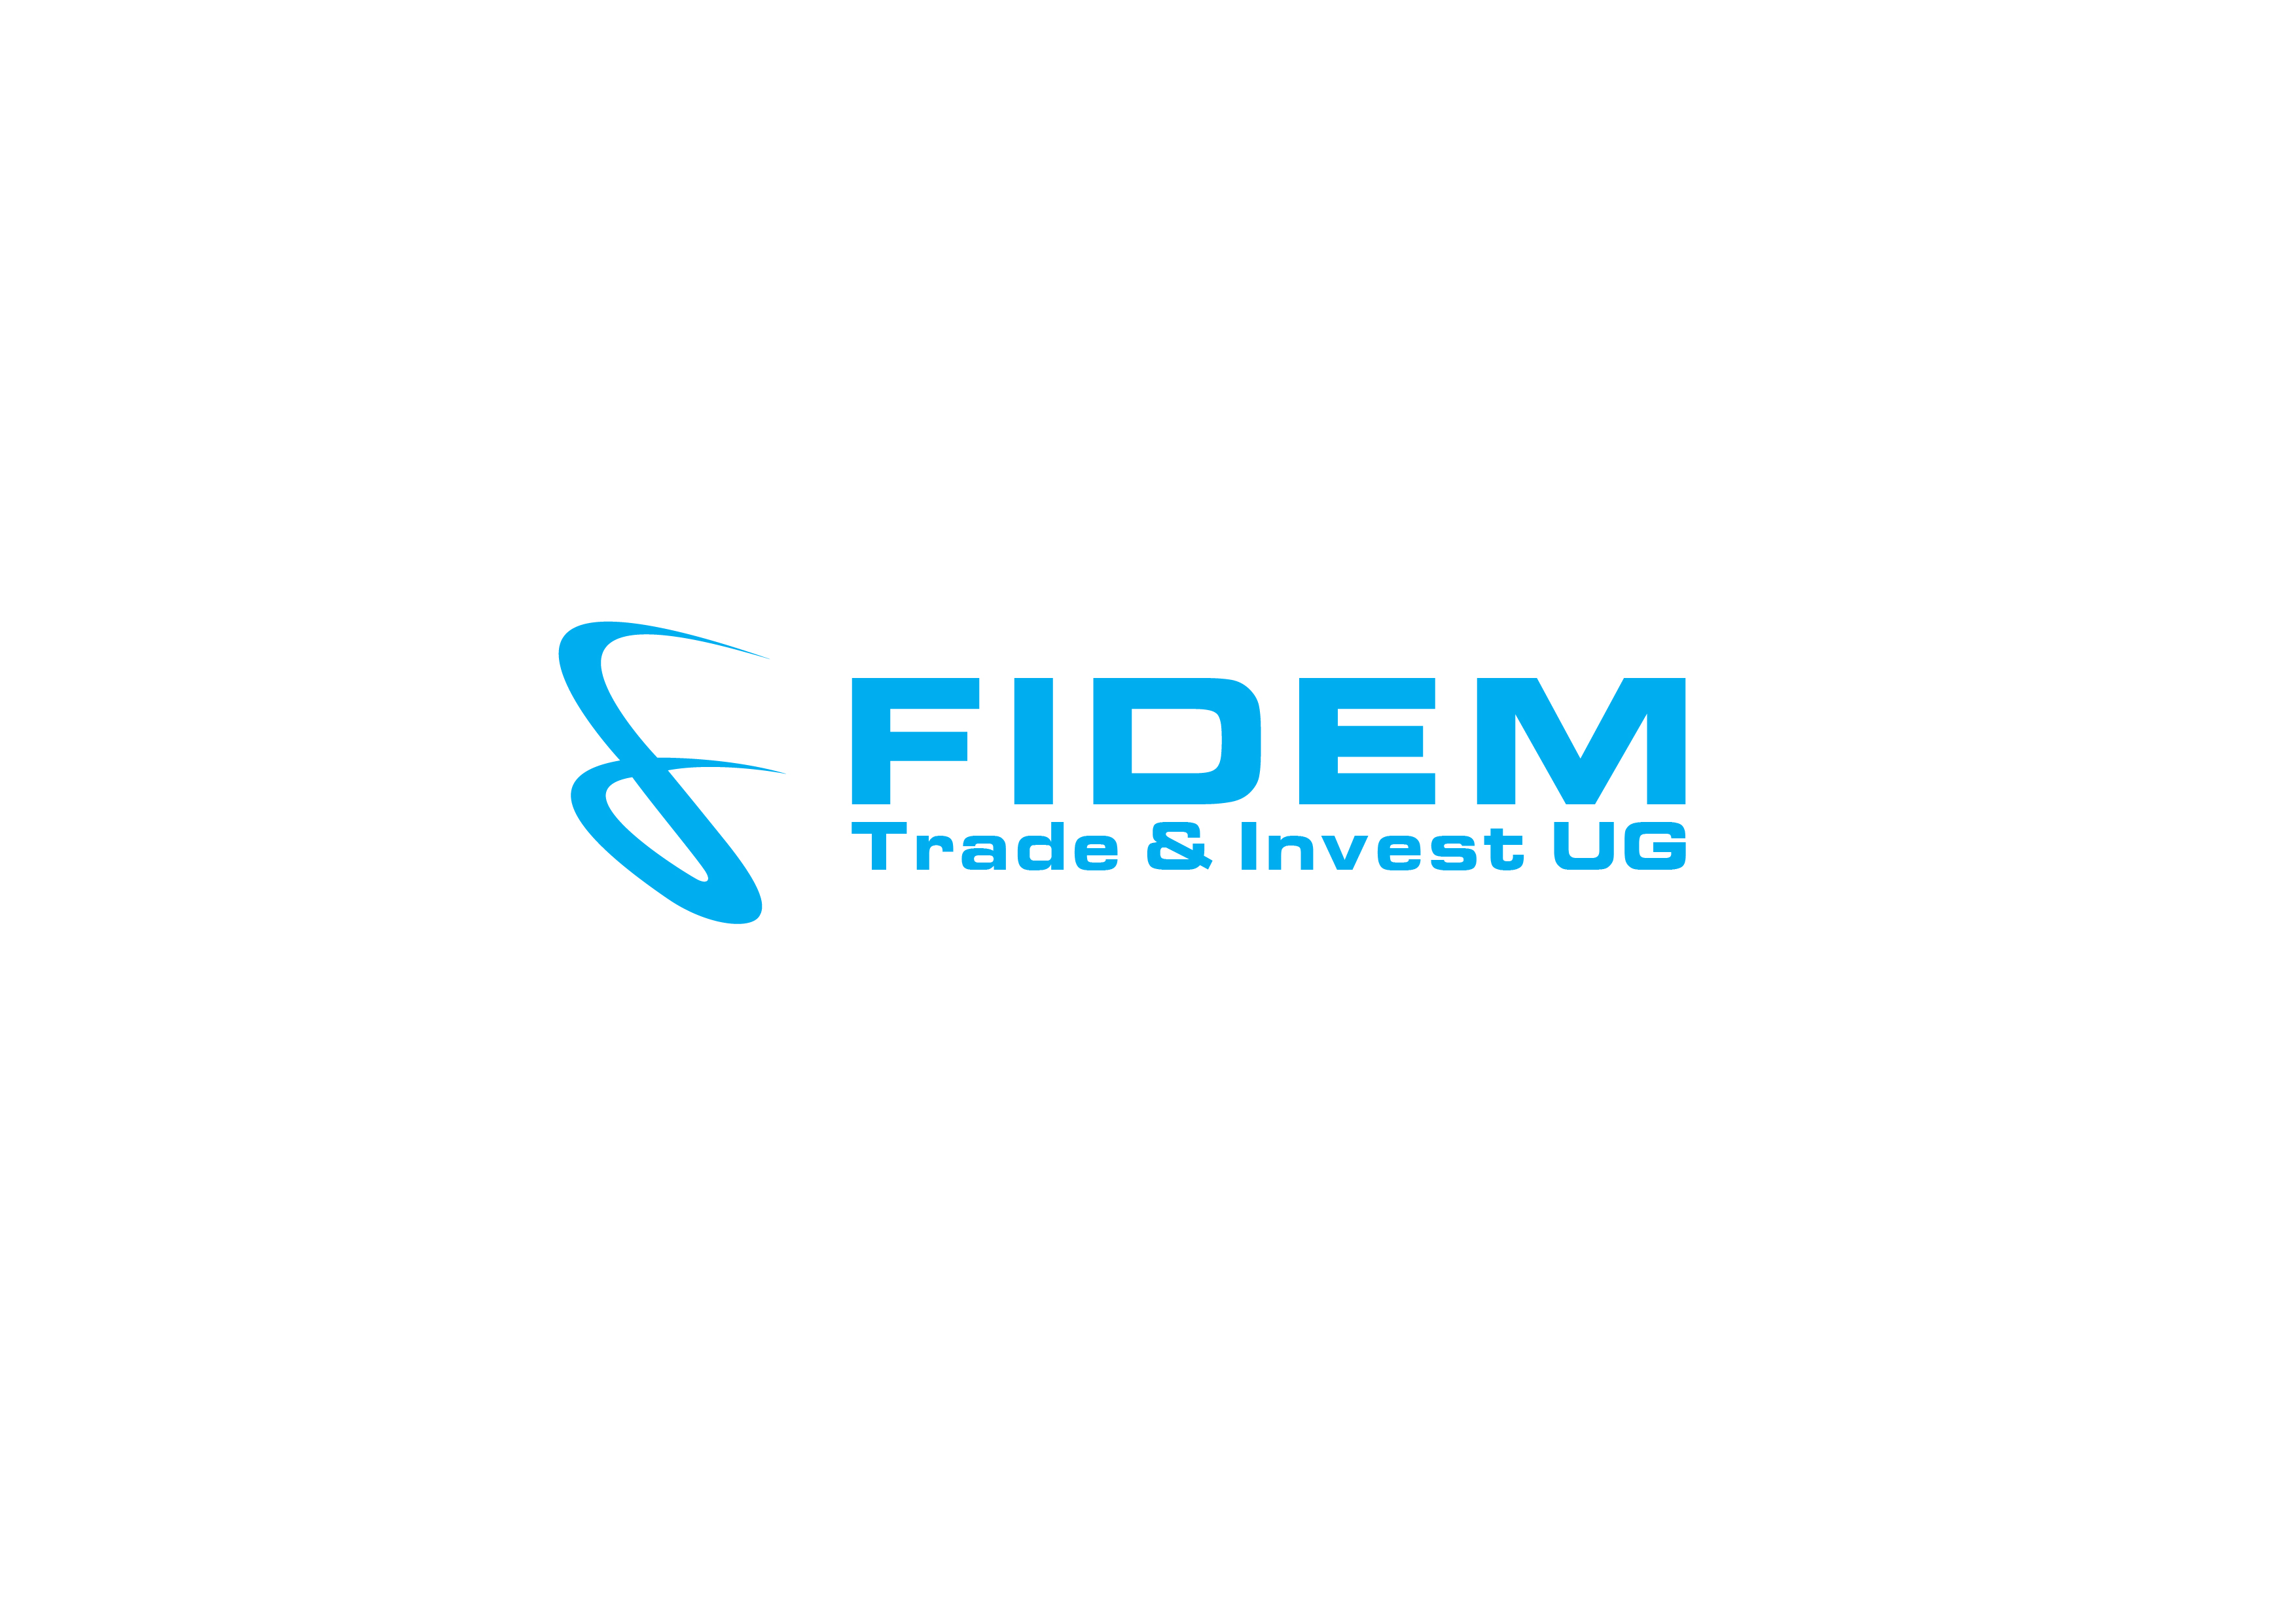 Logo Design by 3draw - Entry No. 765 in the Logo Design Contest Professional Logo Design for FIDEM Trade & Invest UG.